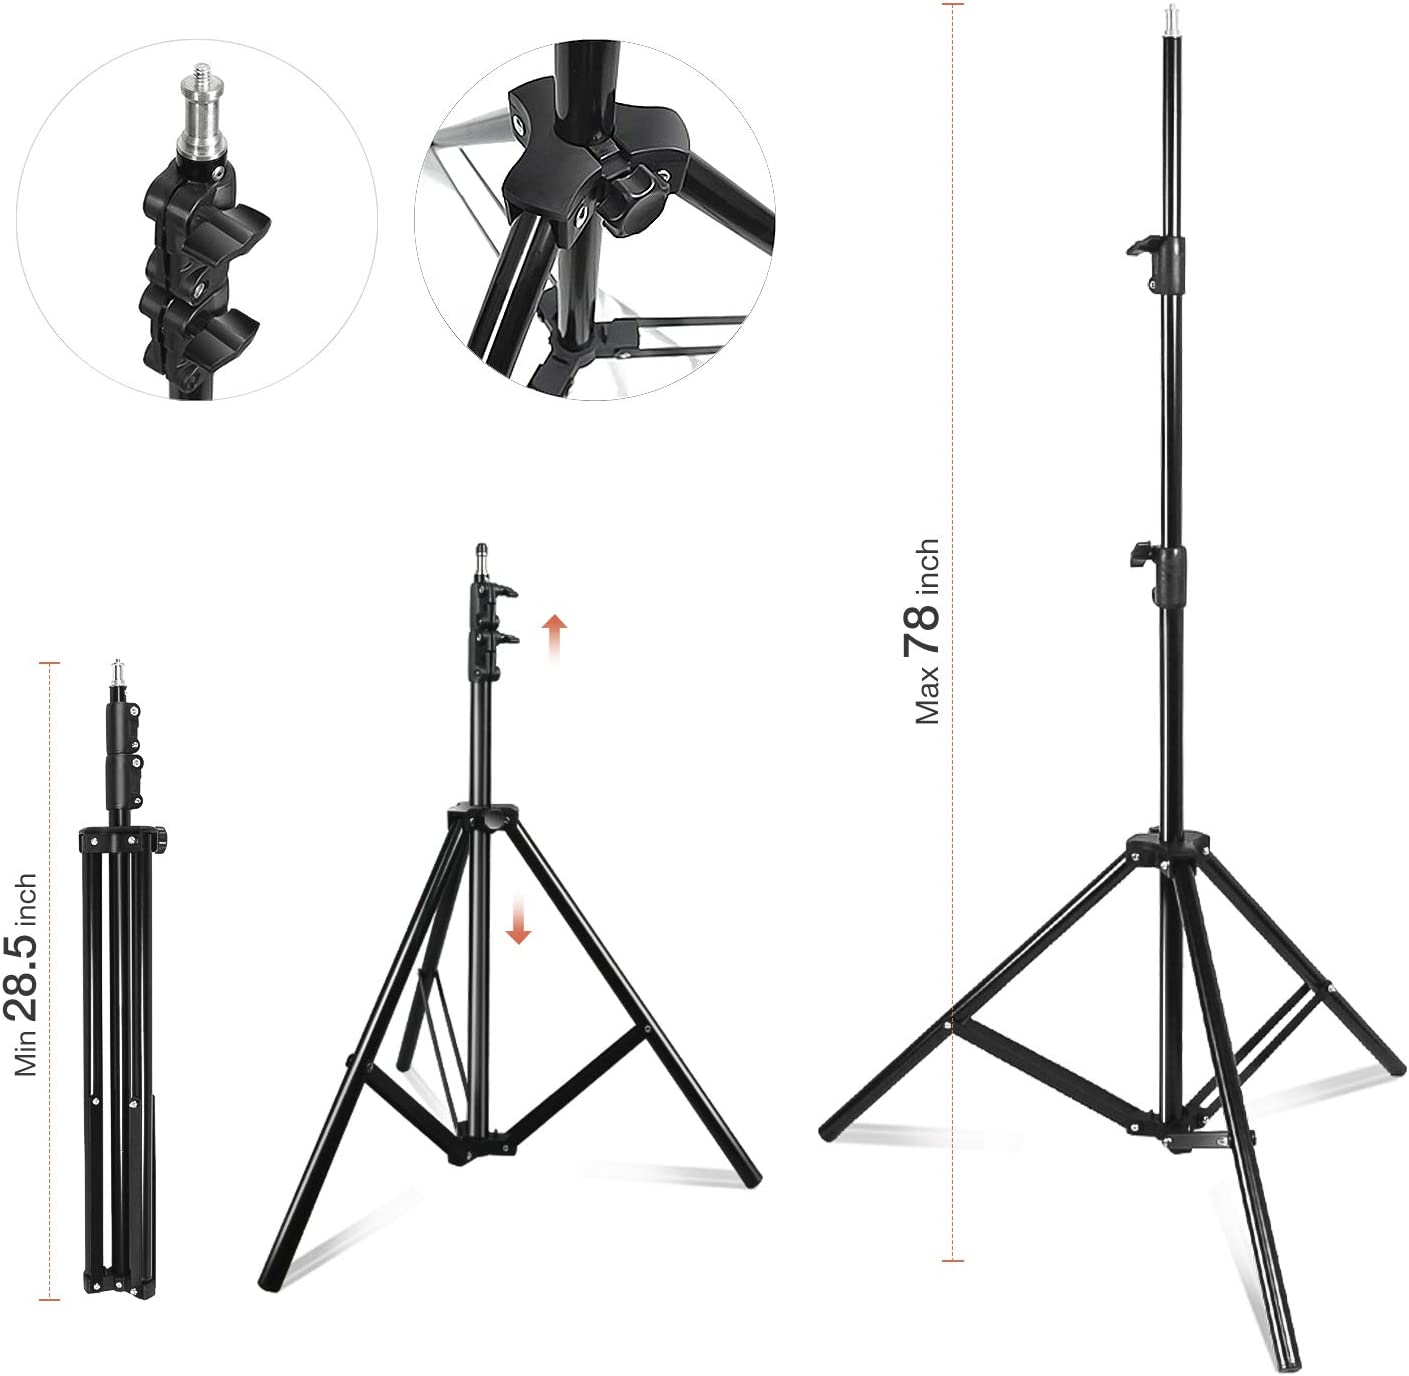 800W Output Light for Video Camera Photography Photo Portrait Studio Julius Studio 20 x 28 inch Soft Box with Bulb Socket Lighting Kit JSAG379